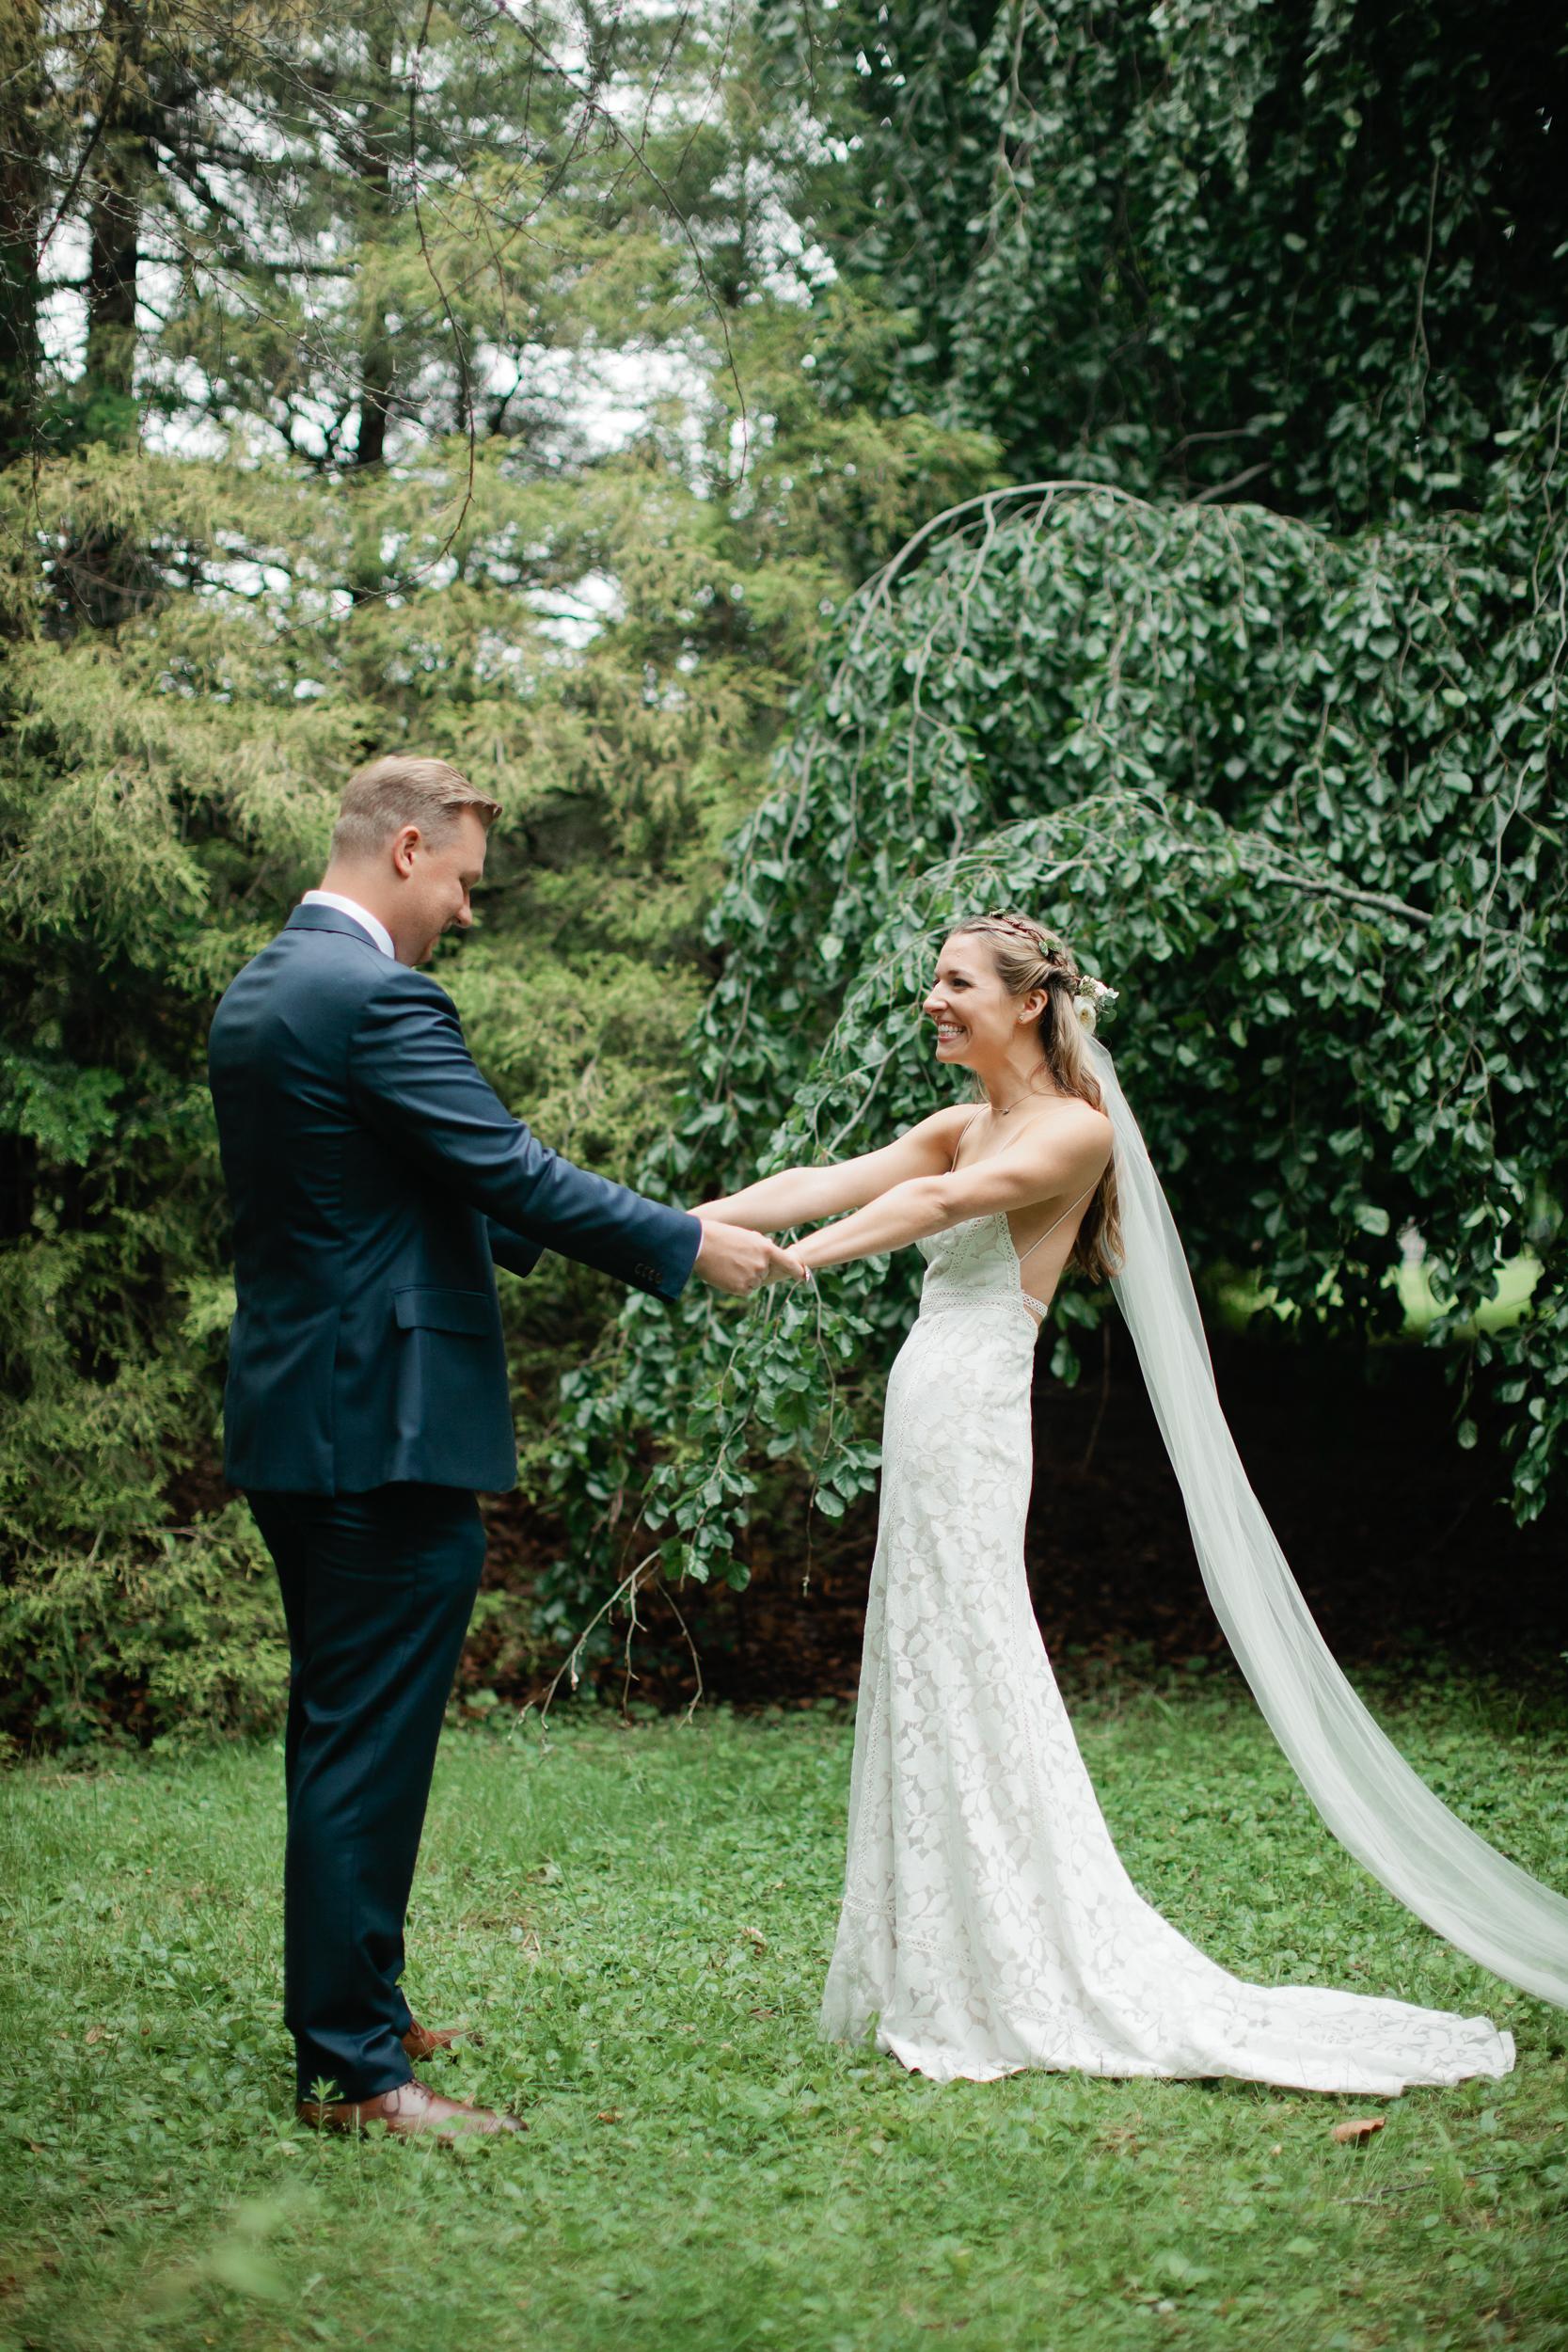 Best-Maine-Wedding-Photographer-69.jpg